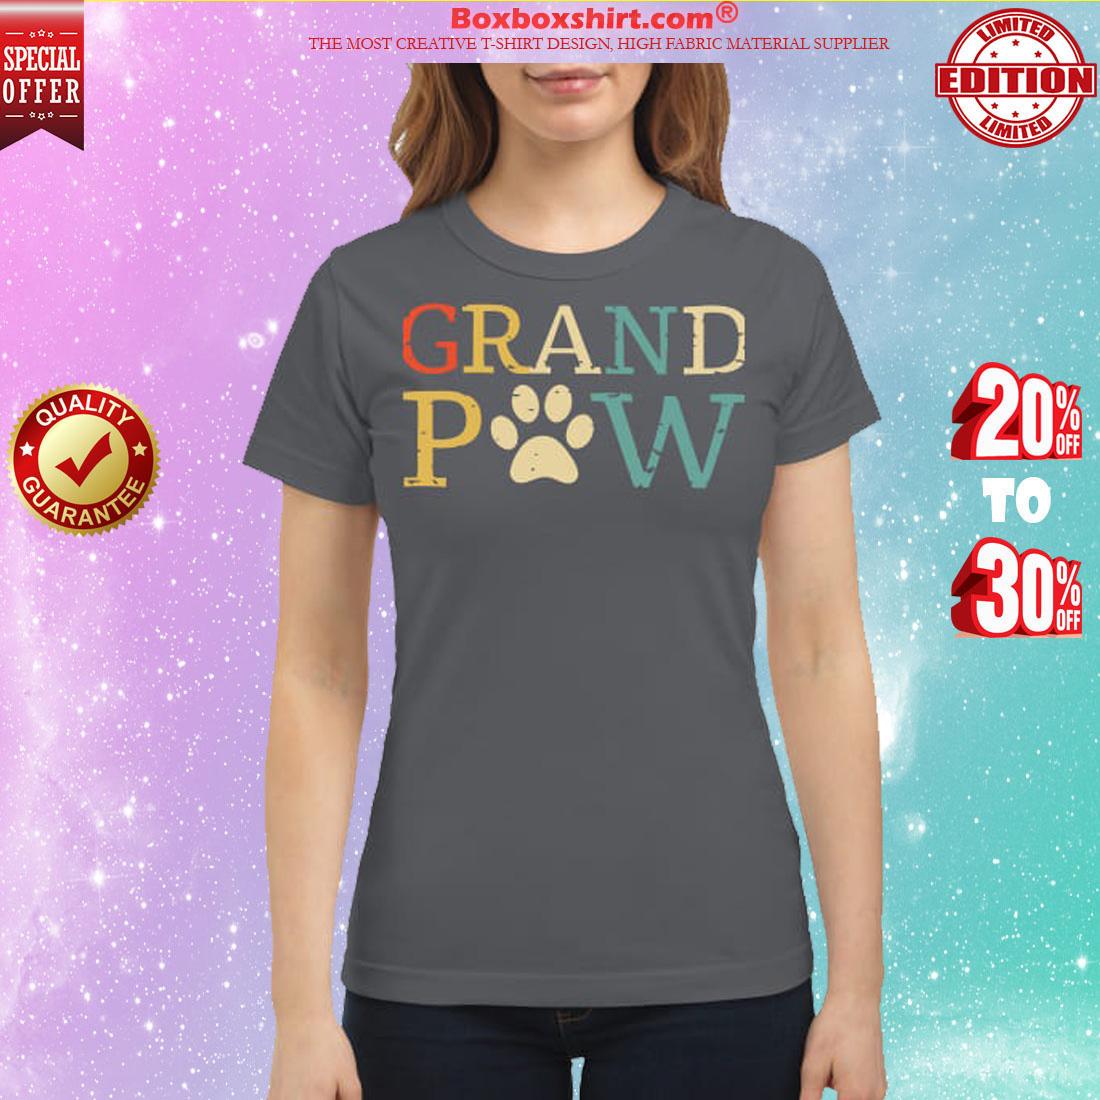 Grand paw classic shirt